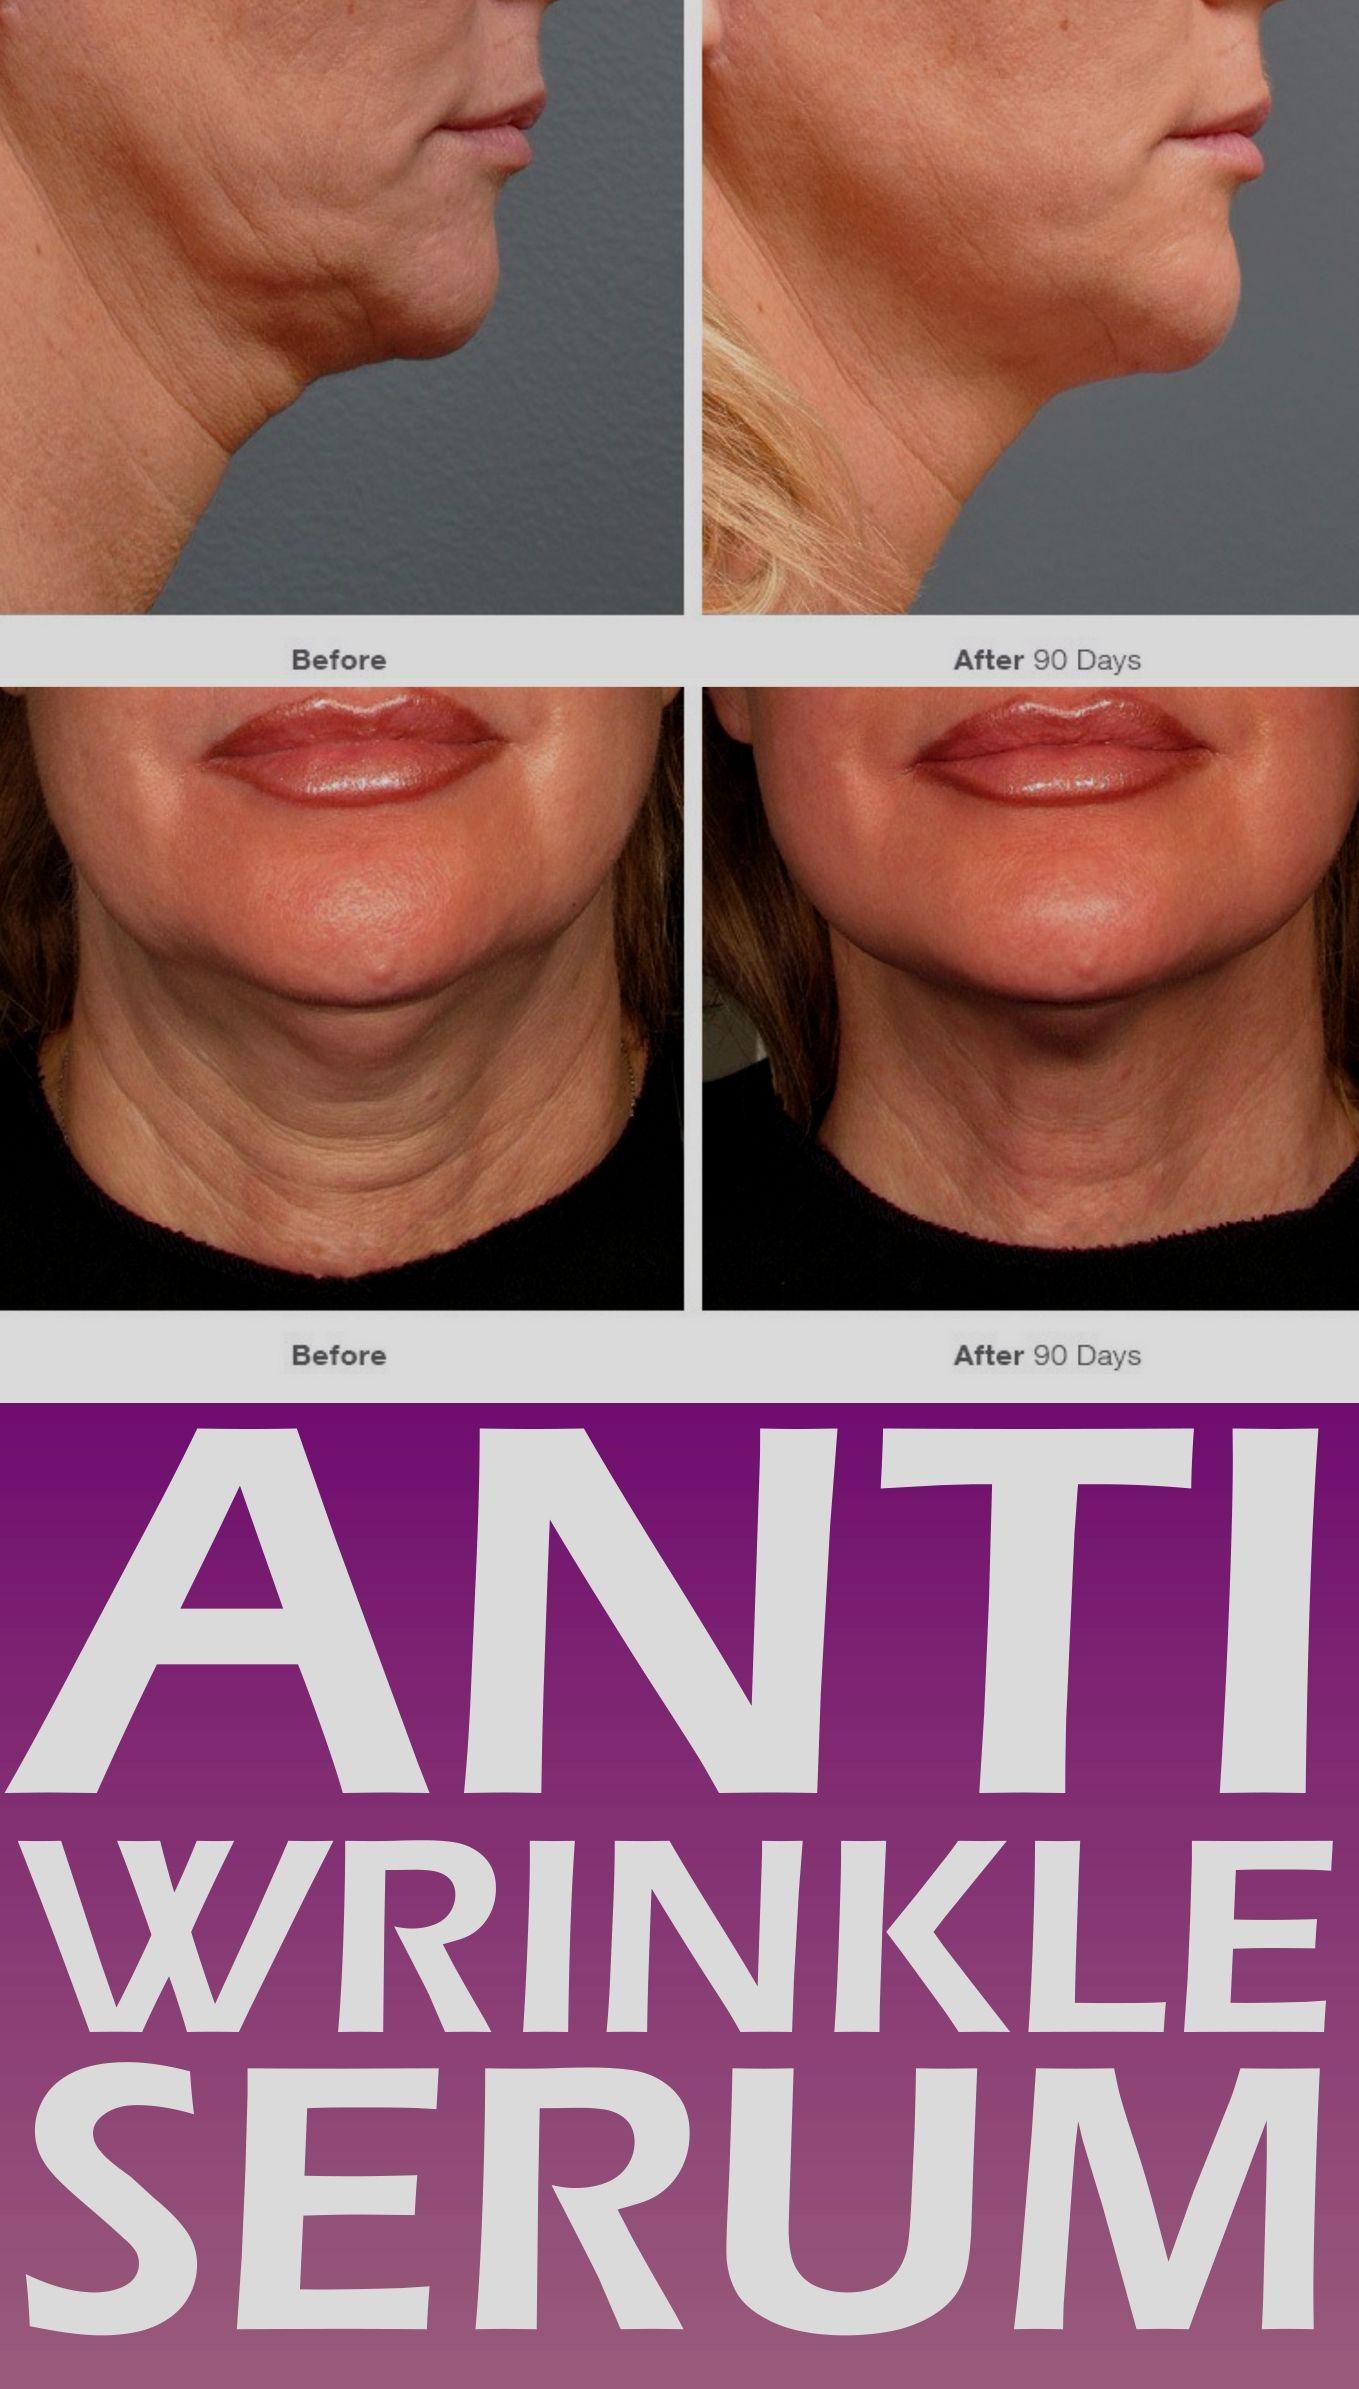 Pin by delmericuji37 on Skin Care in 2020 Anti wrinkle